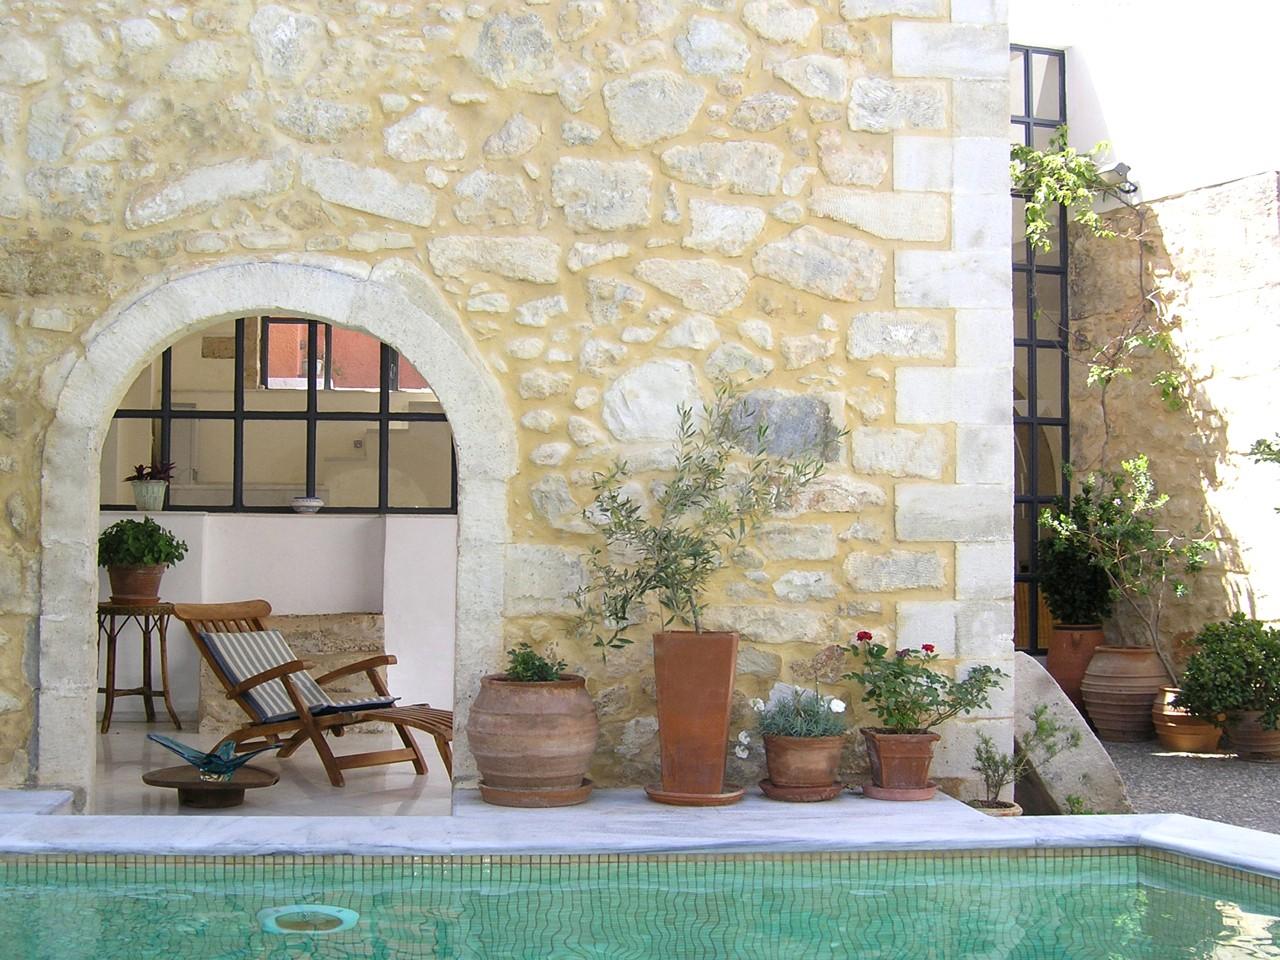 villa maroulas rethimno crete, family villa maroulas rethymno crete, villa maroulas private pool crete